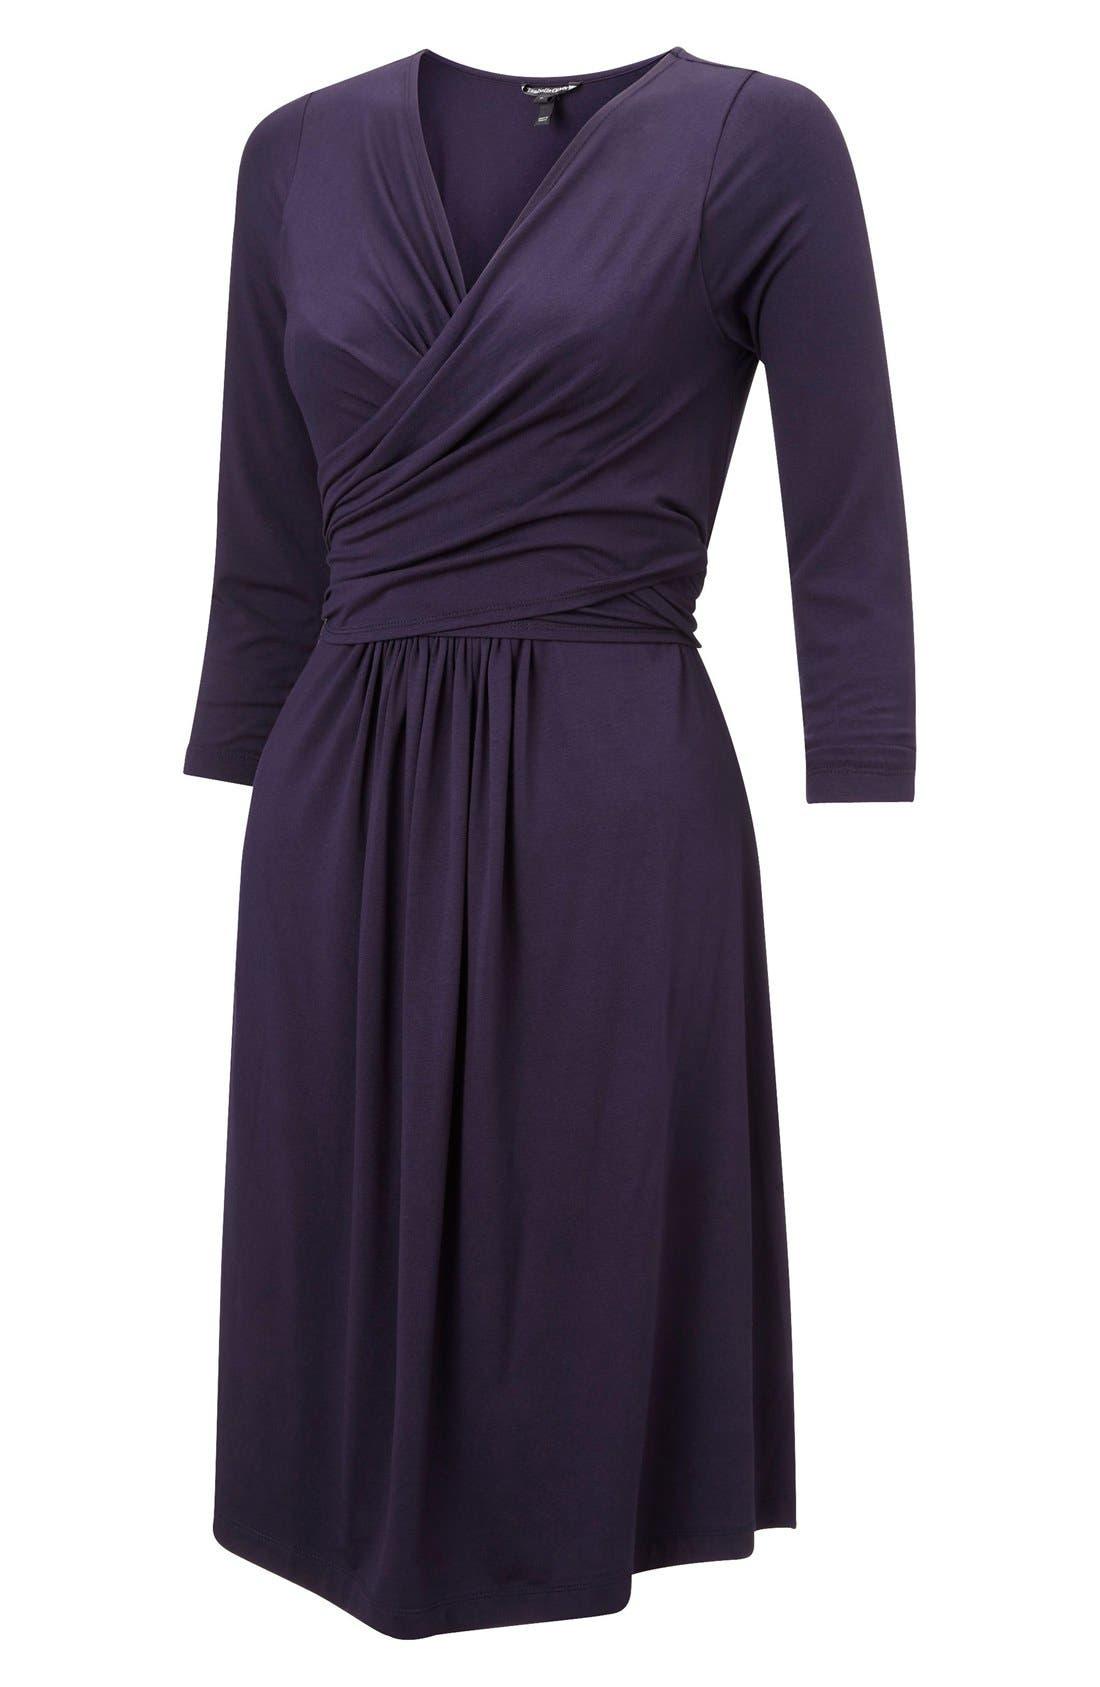 'Avebury' Nursing Wrap Maternity Dress,                             Main thumbnail 1, color,                             Darkest Navy